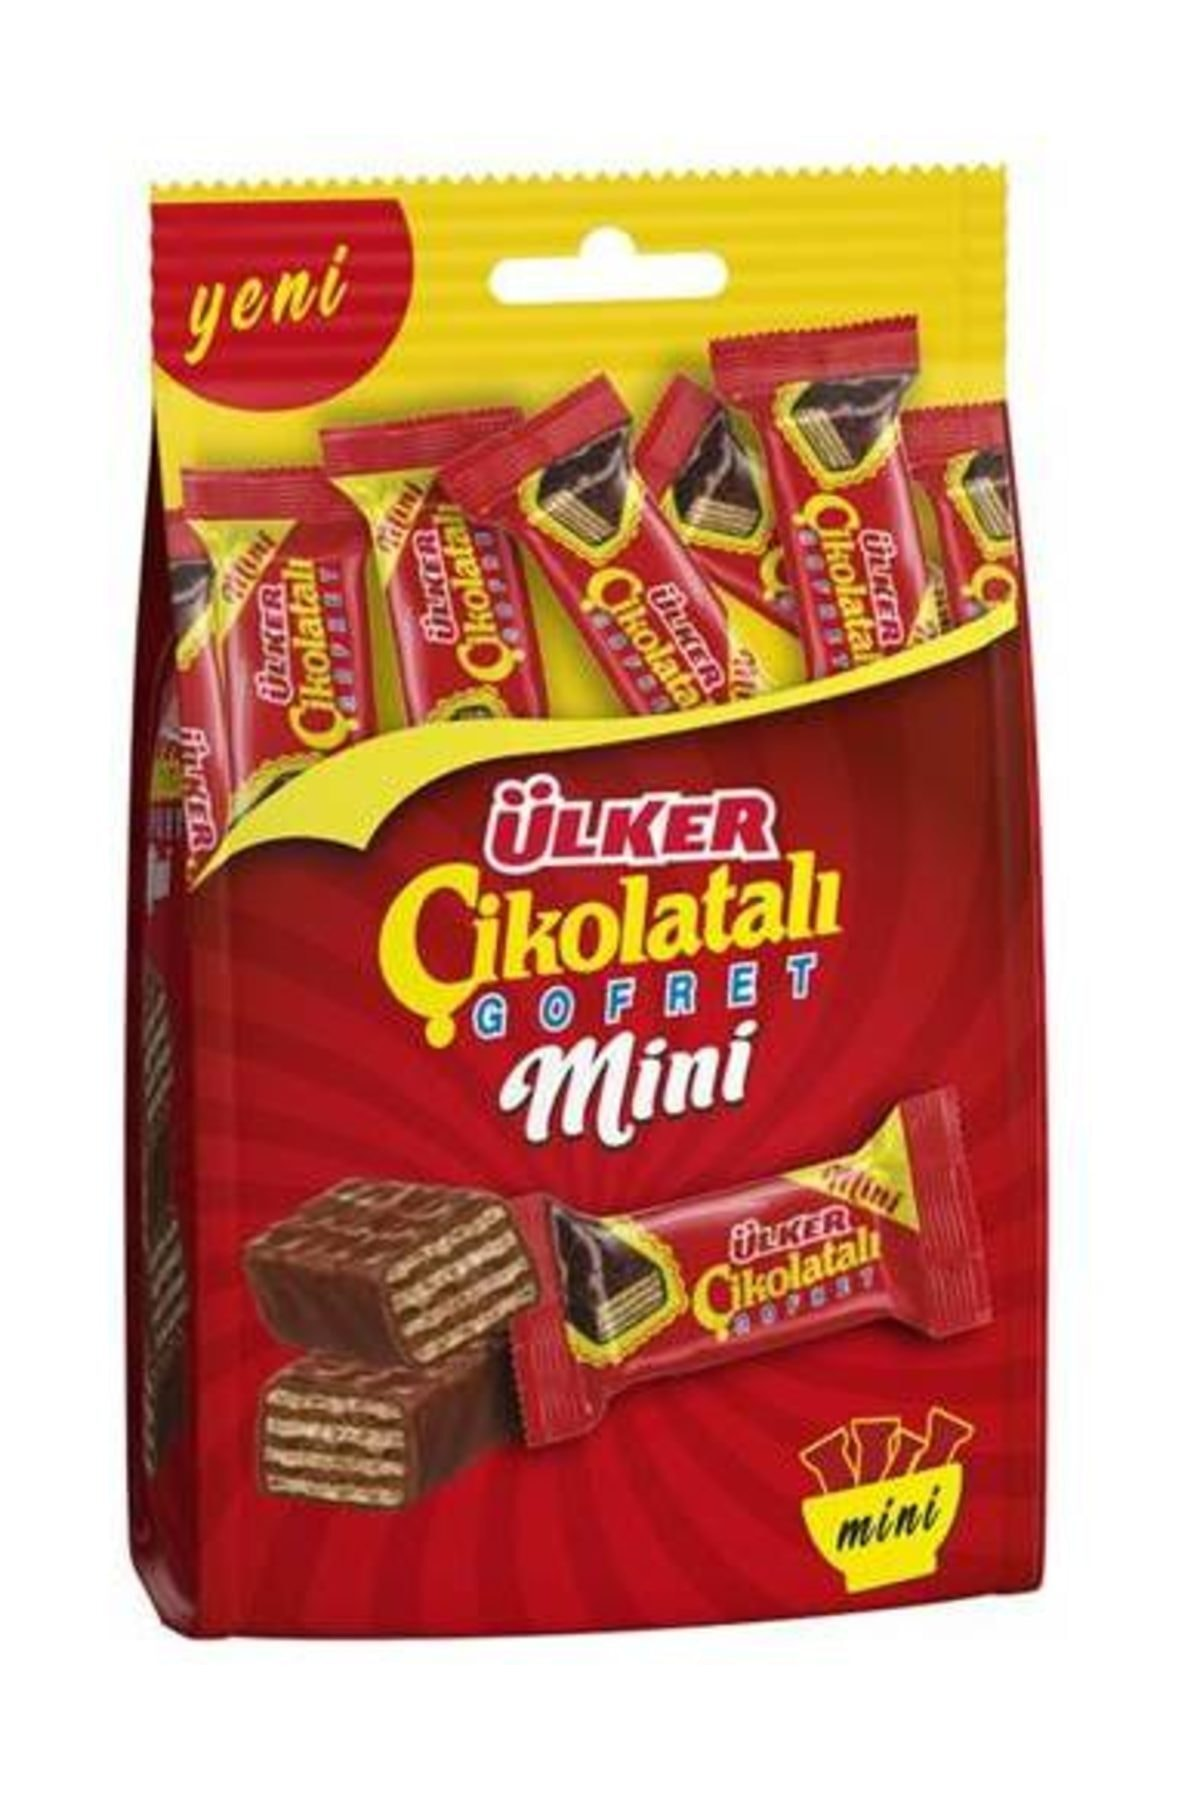 Ülker Mini Çikolatalı Gofret Çoklu Paket Çikolata 82 gr 1